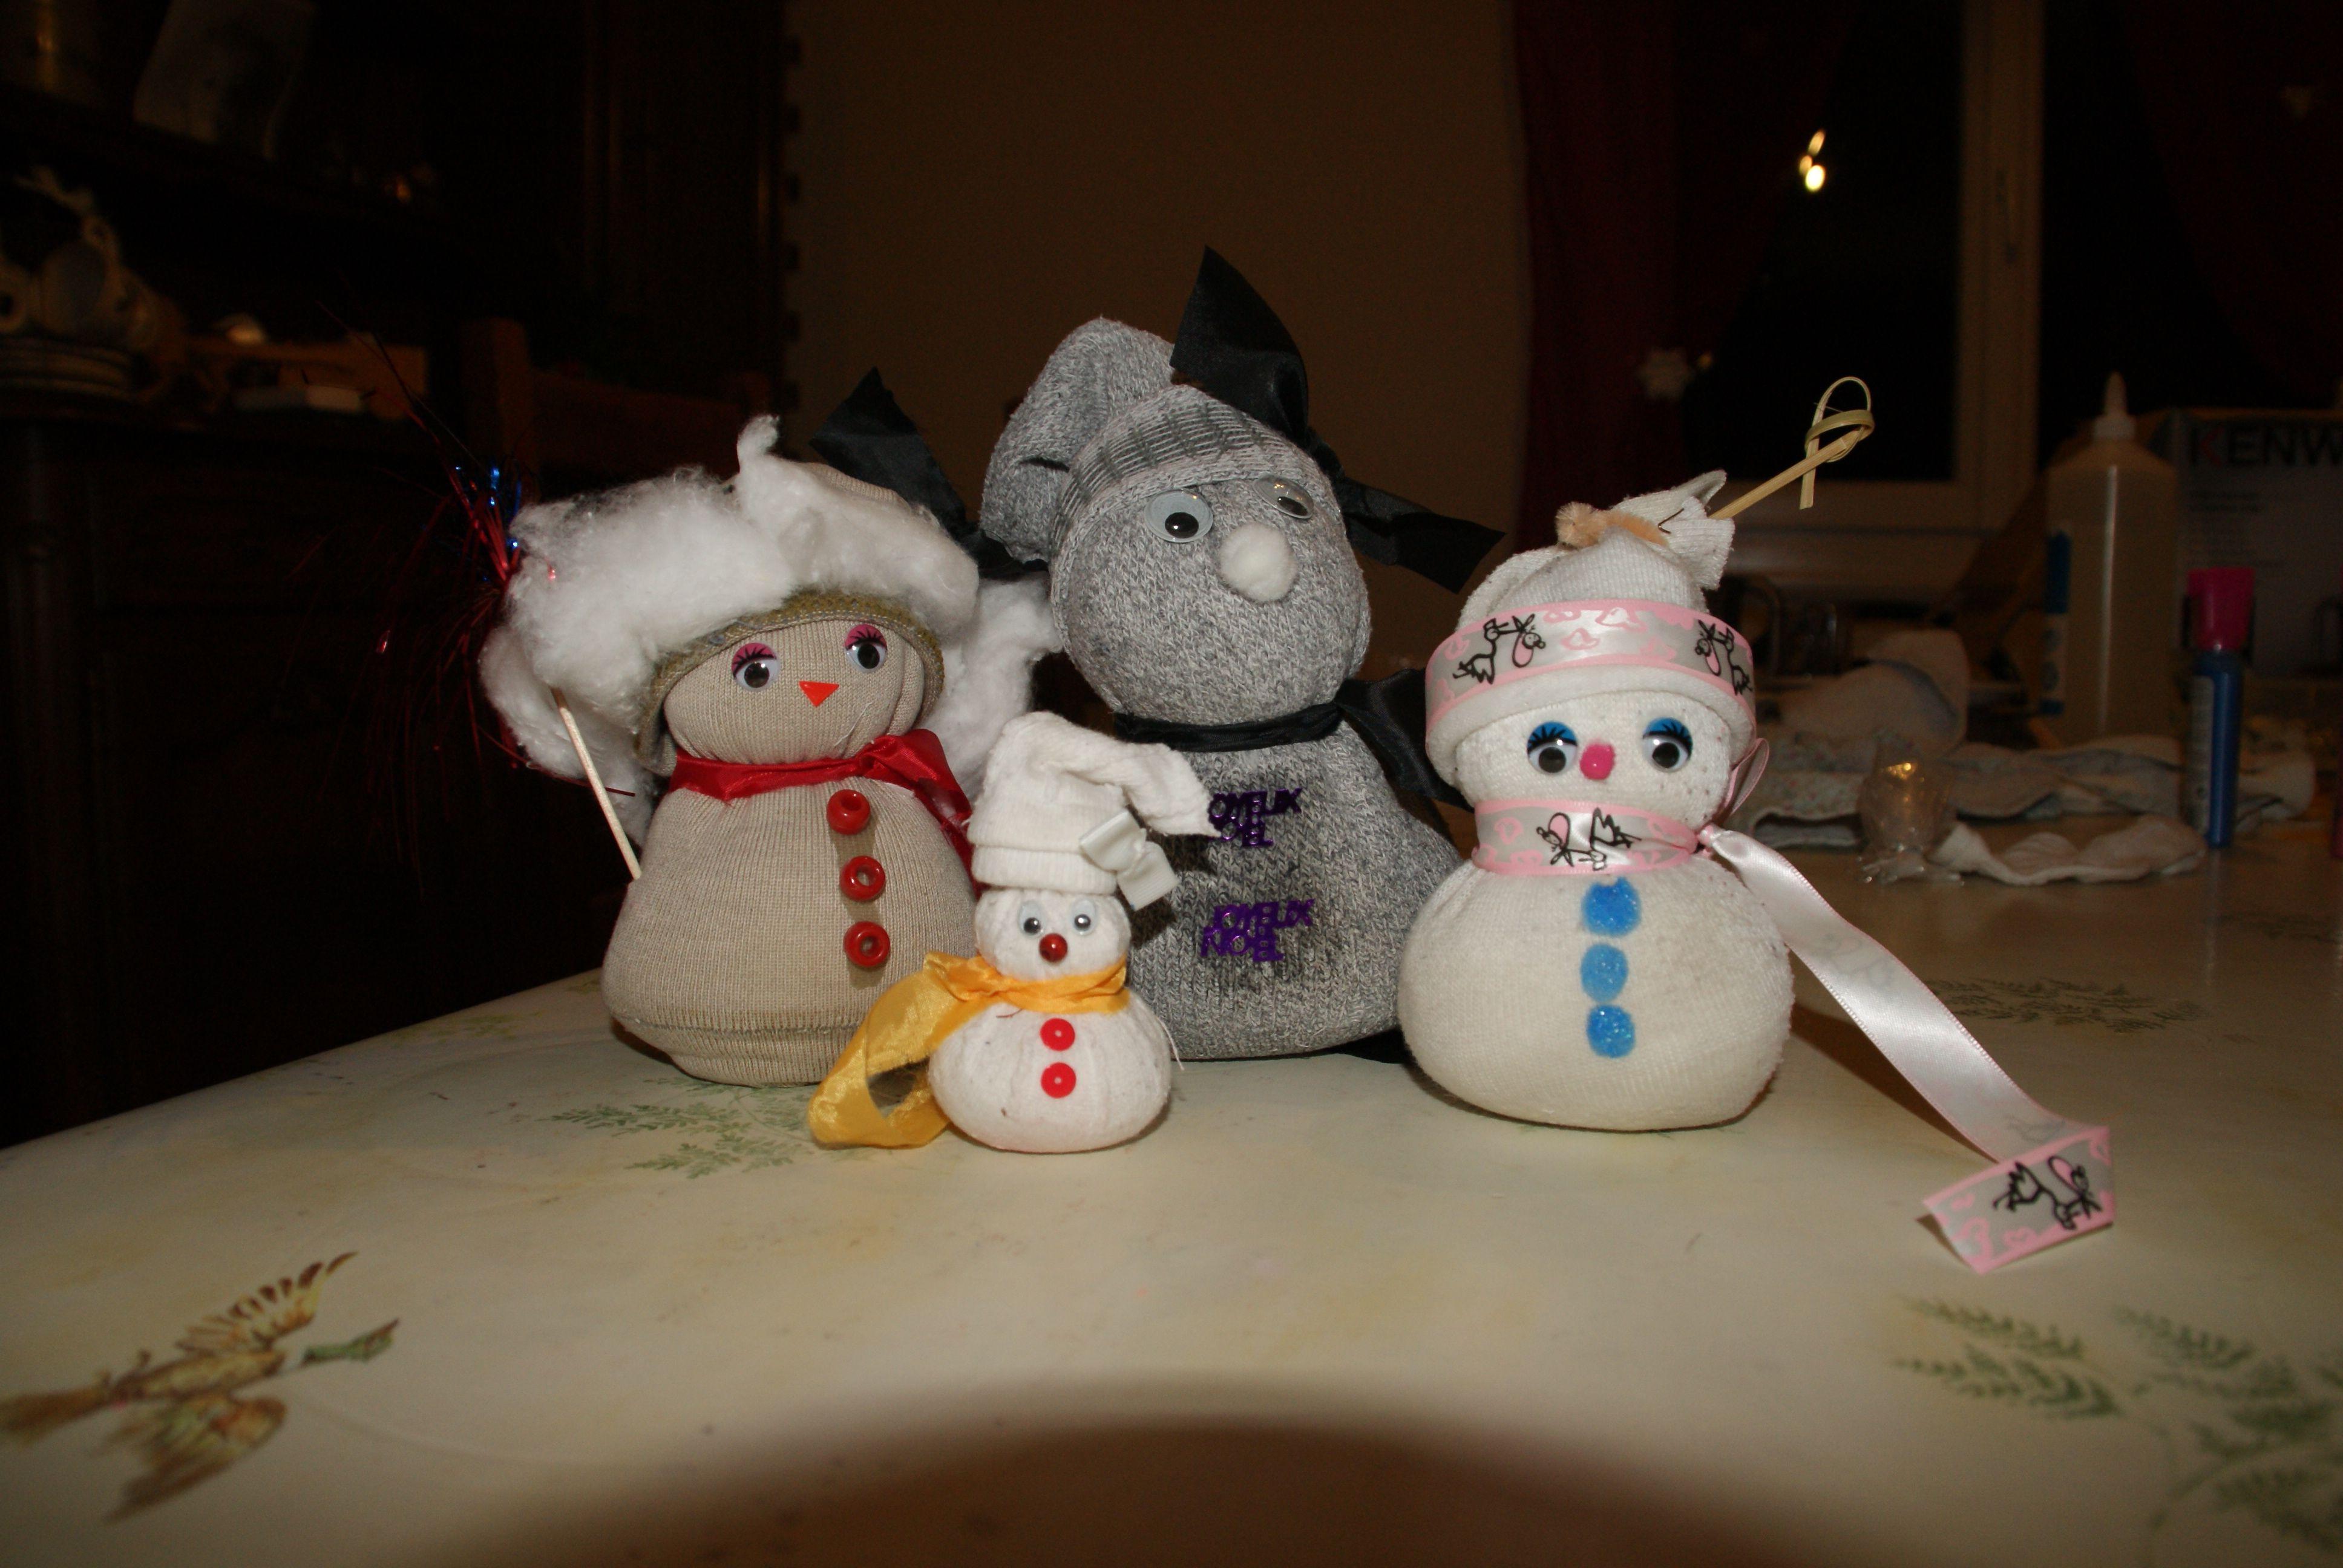 La tribu des bonhommes de neige - Bonhomme de neige en chaussette ...